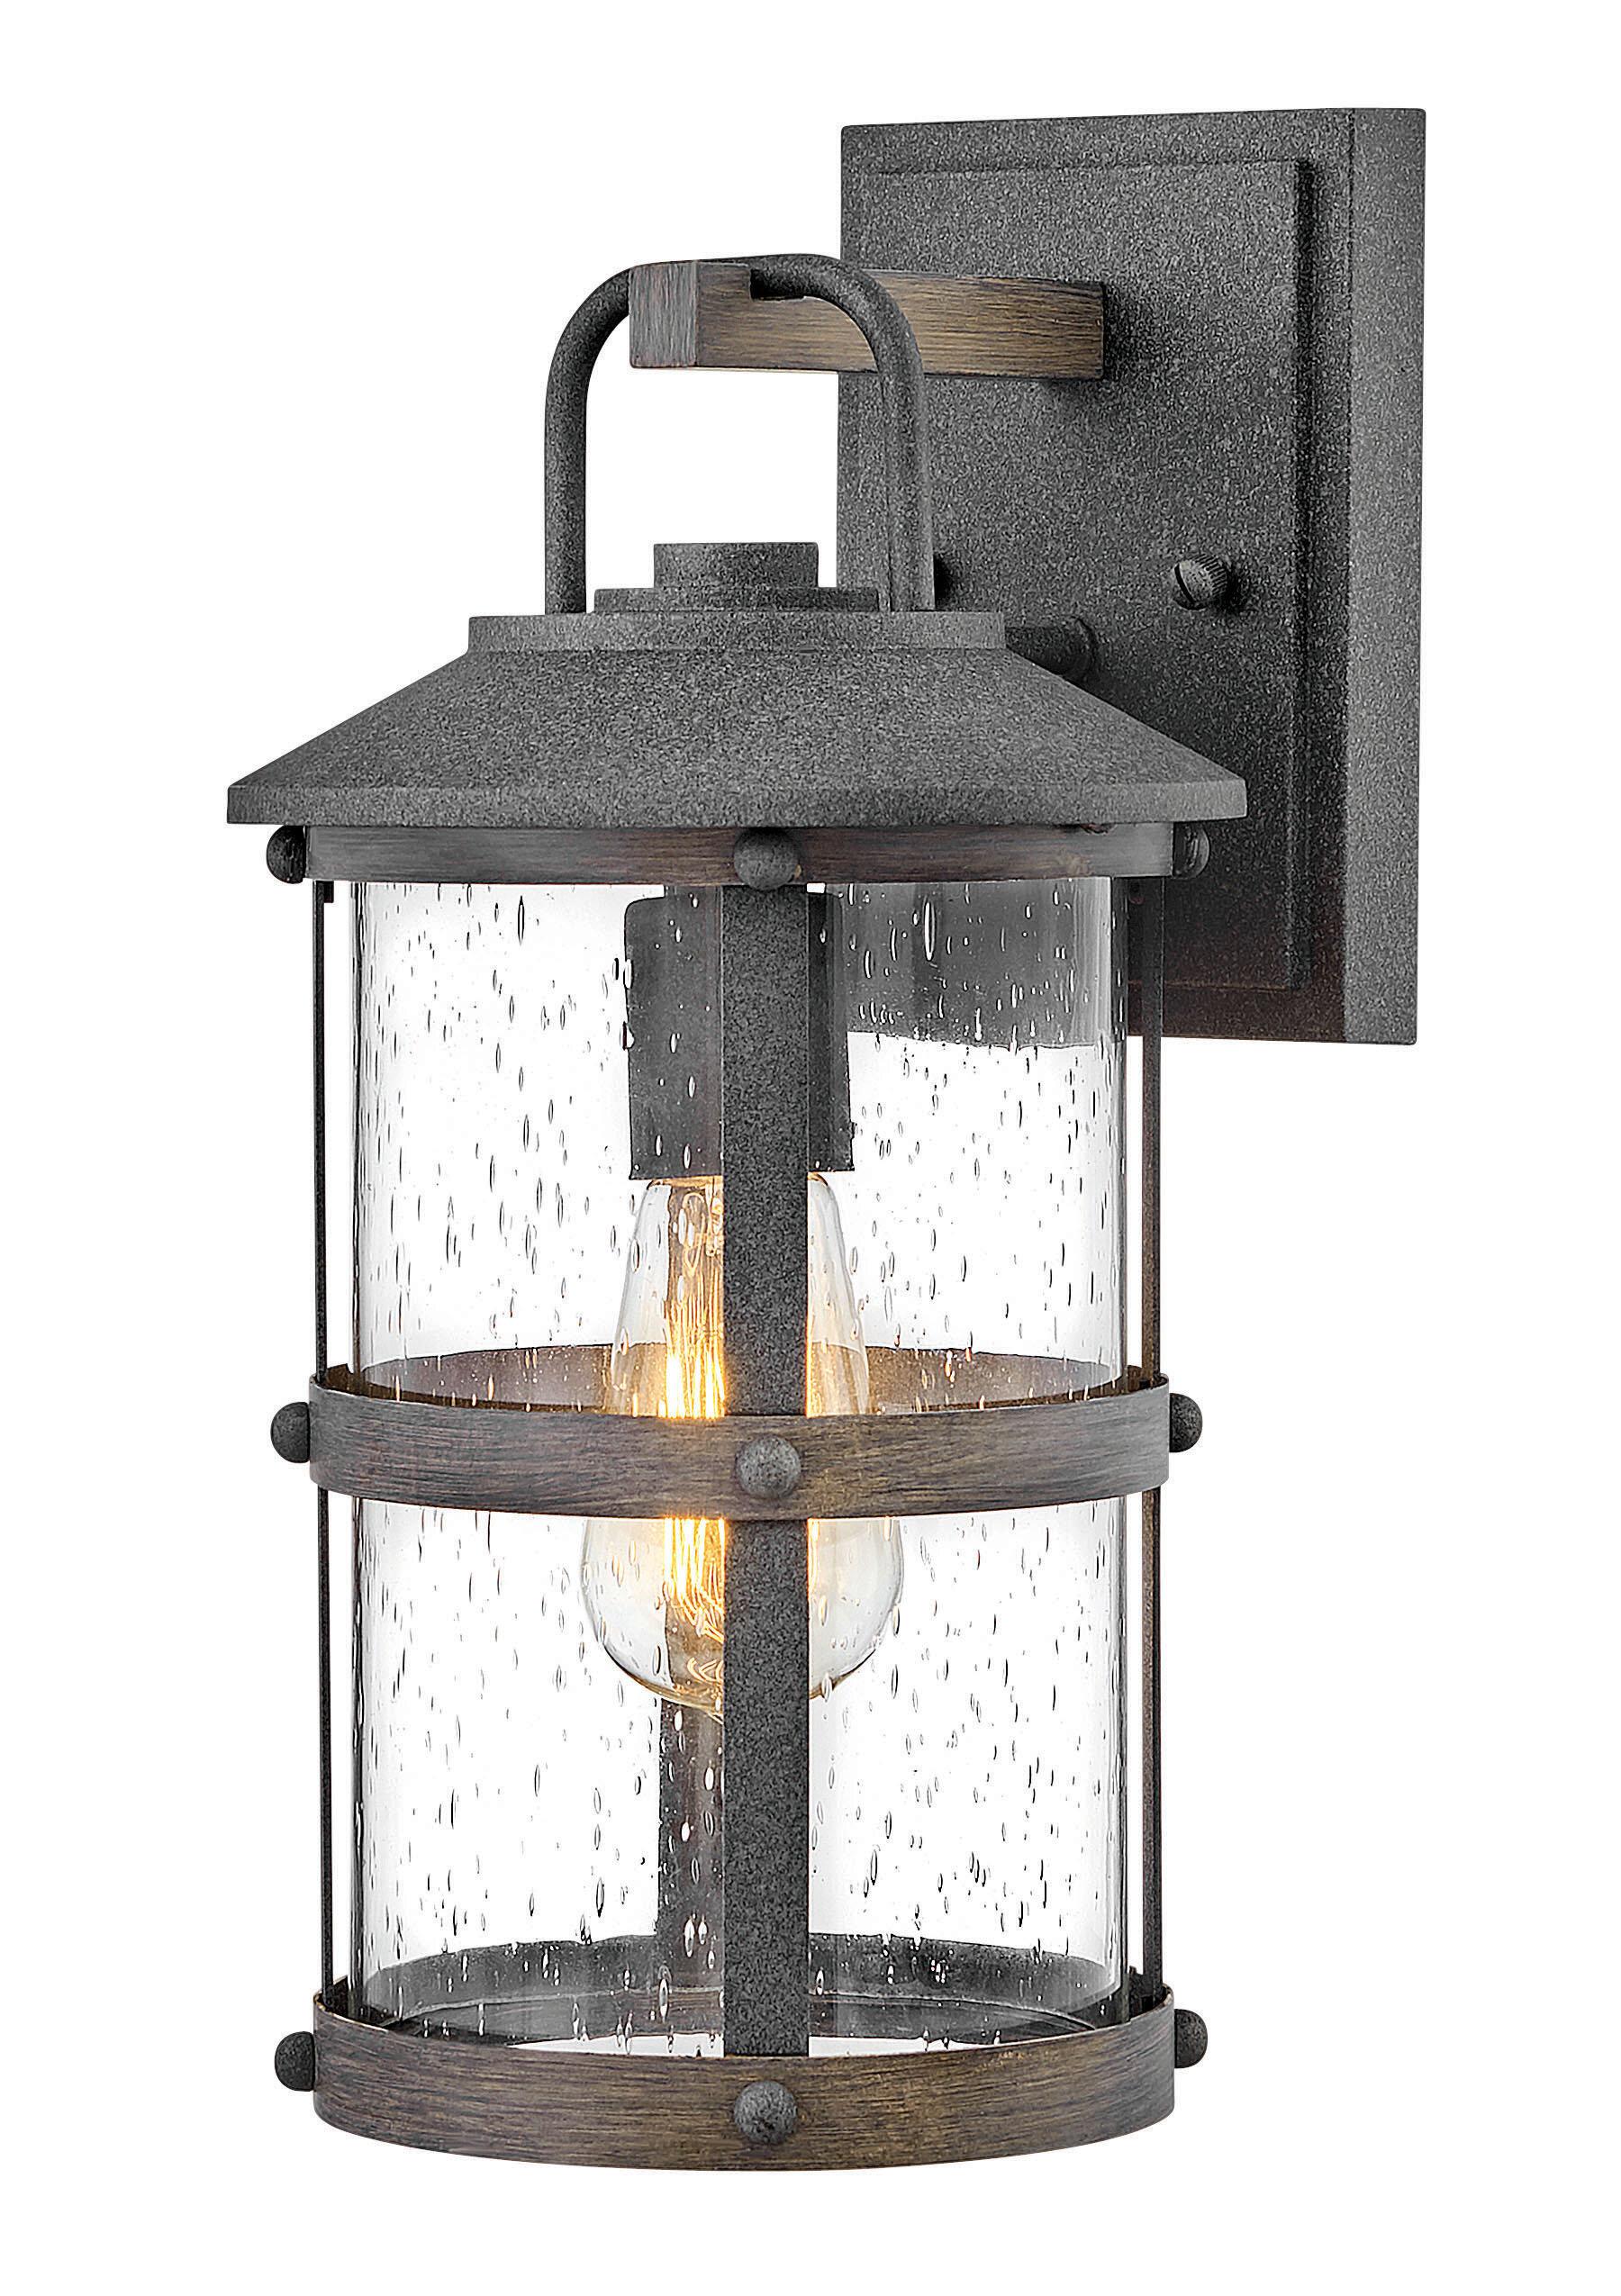 Longshore Tides Carreras Outdoor Wall Lantern Wayfair